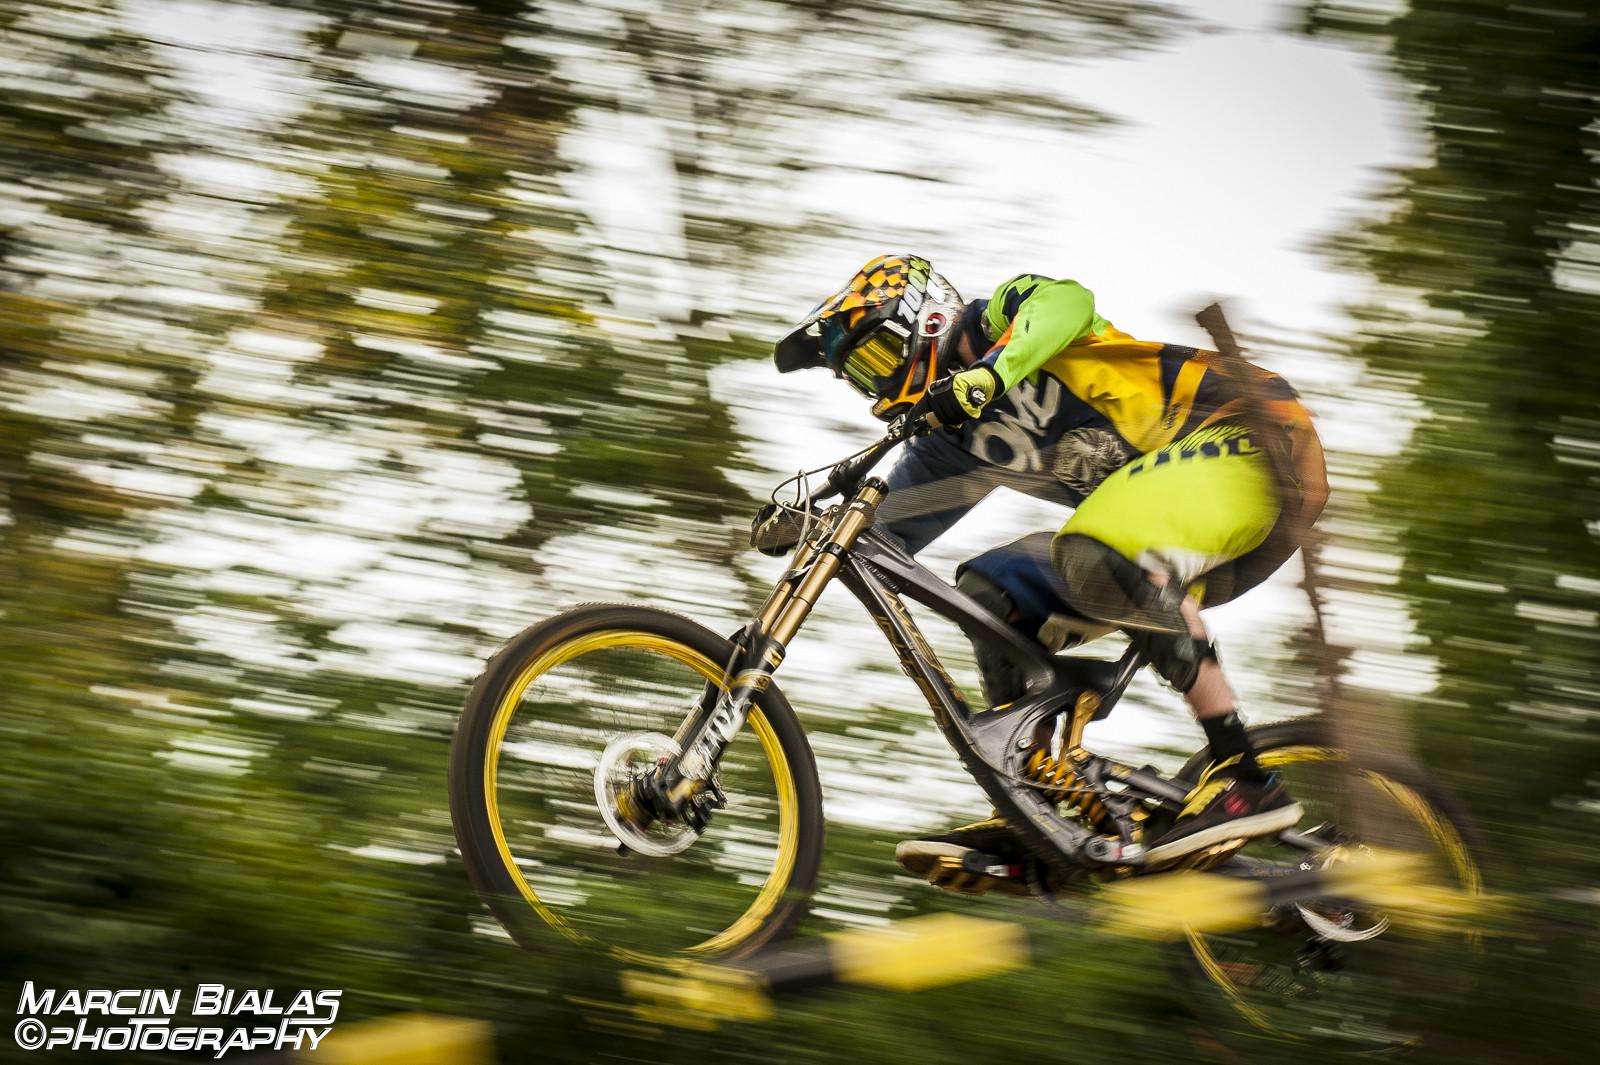 Gary in race mode - Marcin Bialas Photography - Mountain Biking Pictures - Vital MTB